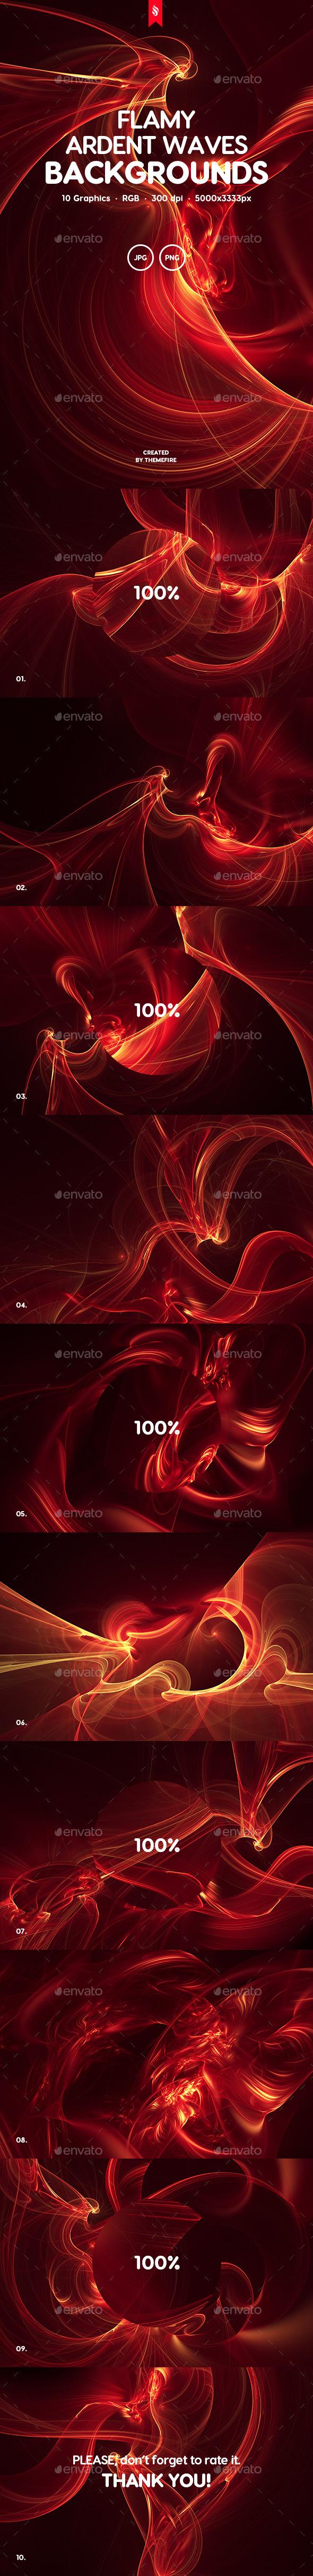 Flamy - Ardent Waves Background Set